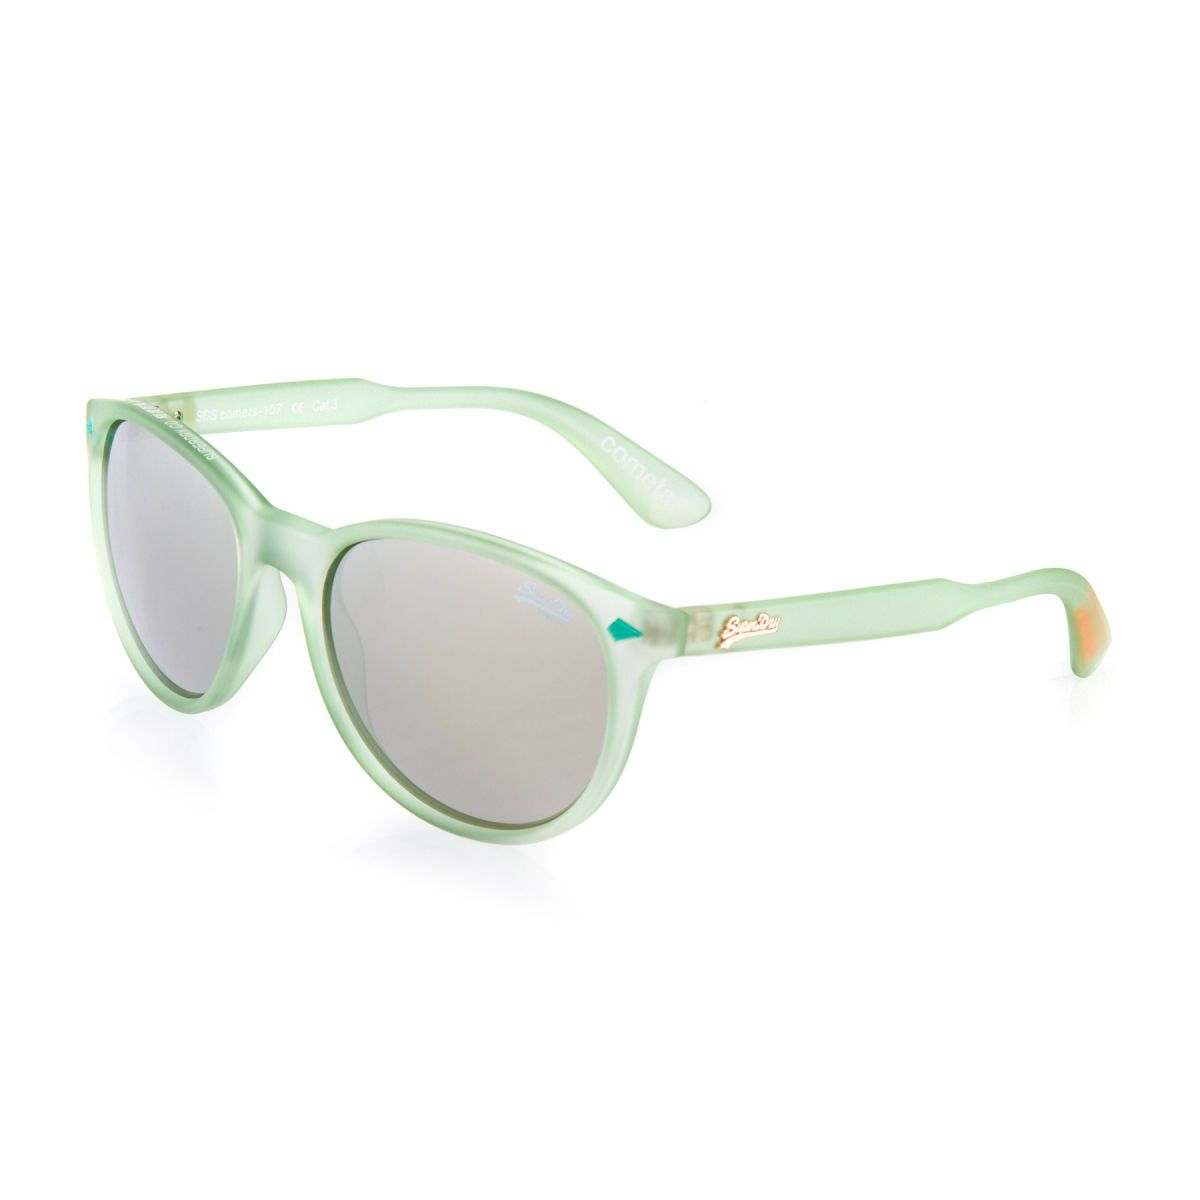 5a3339fd4c86e7 Superdry Comets Sunglasses - Matte Pastel Green chrome Mirror ...